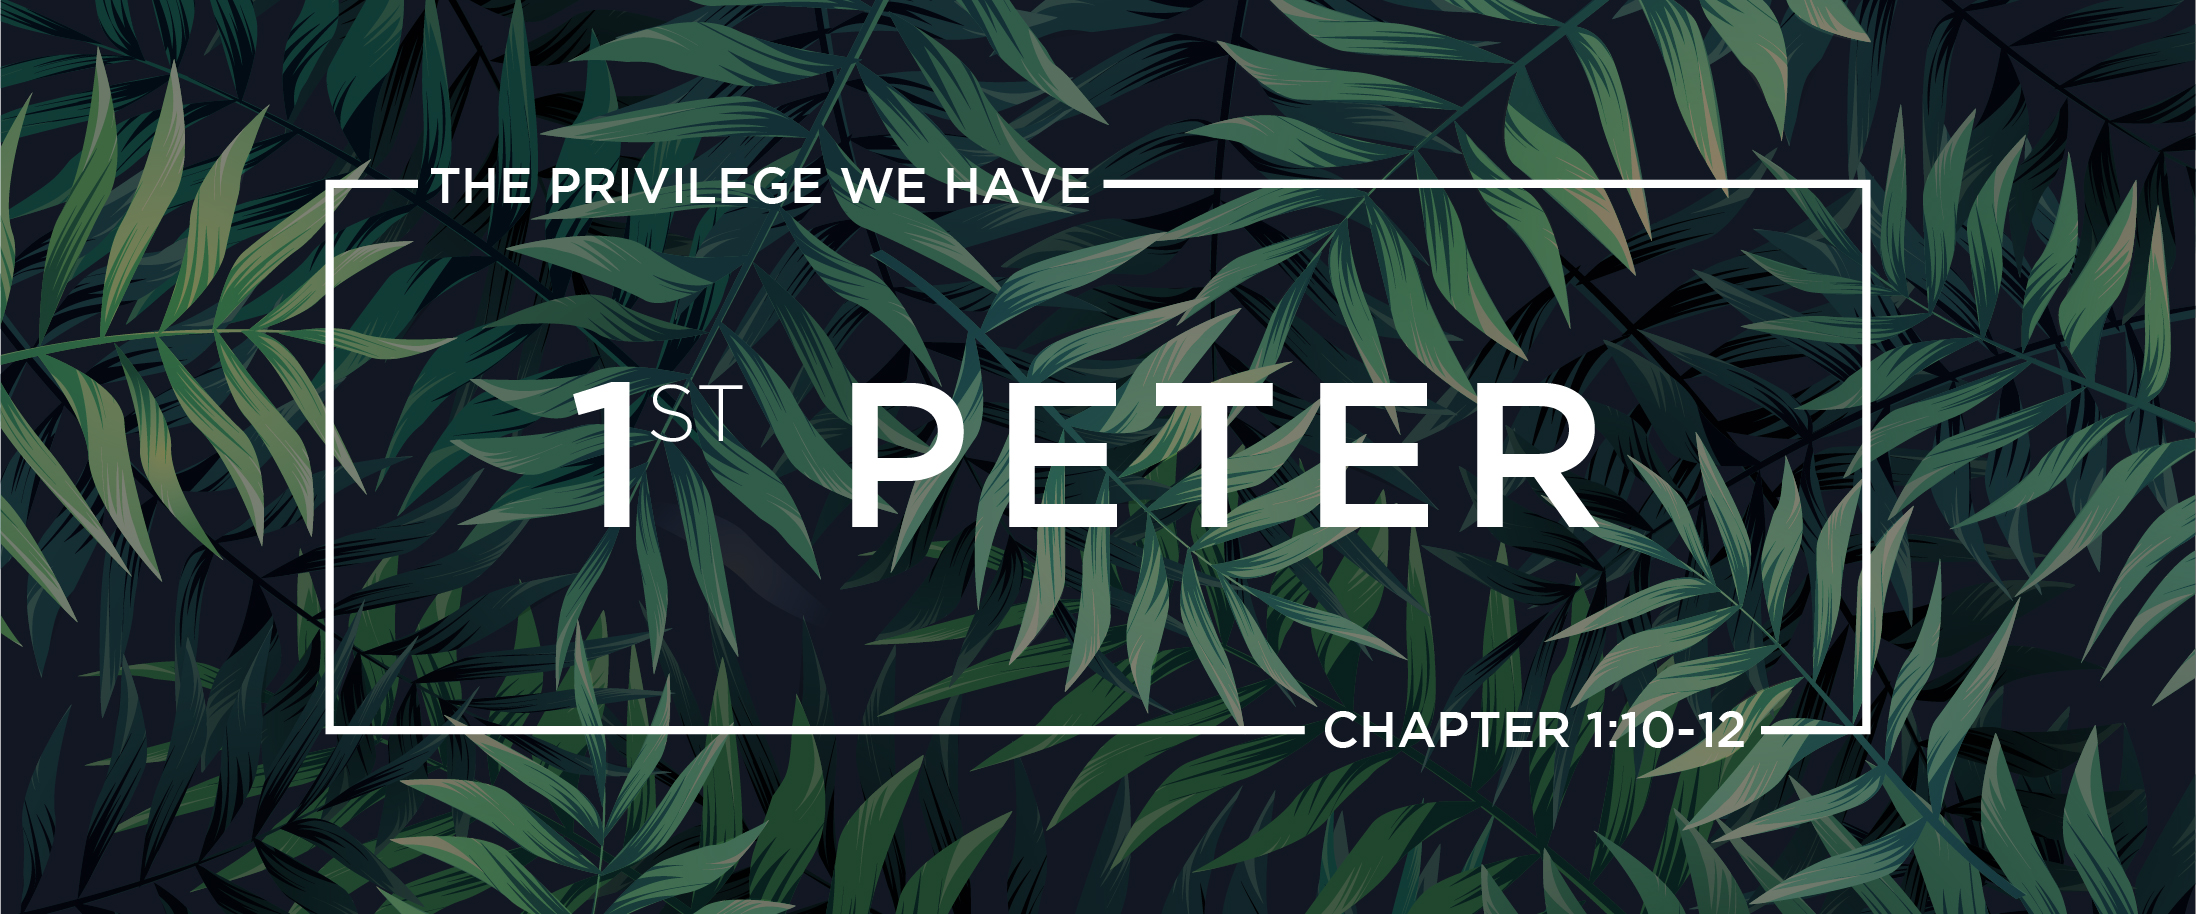 SBC, 1 Peter, Message-01-01.jpg